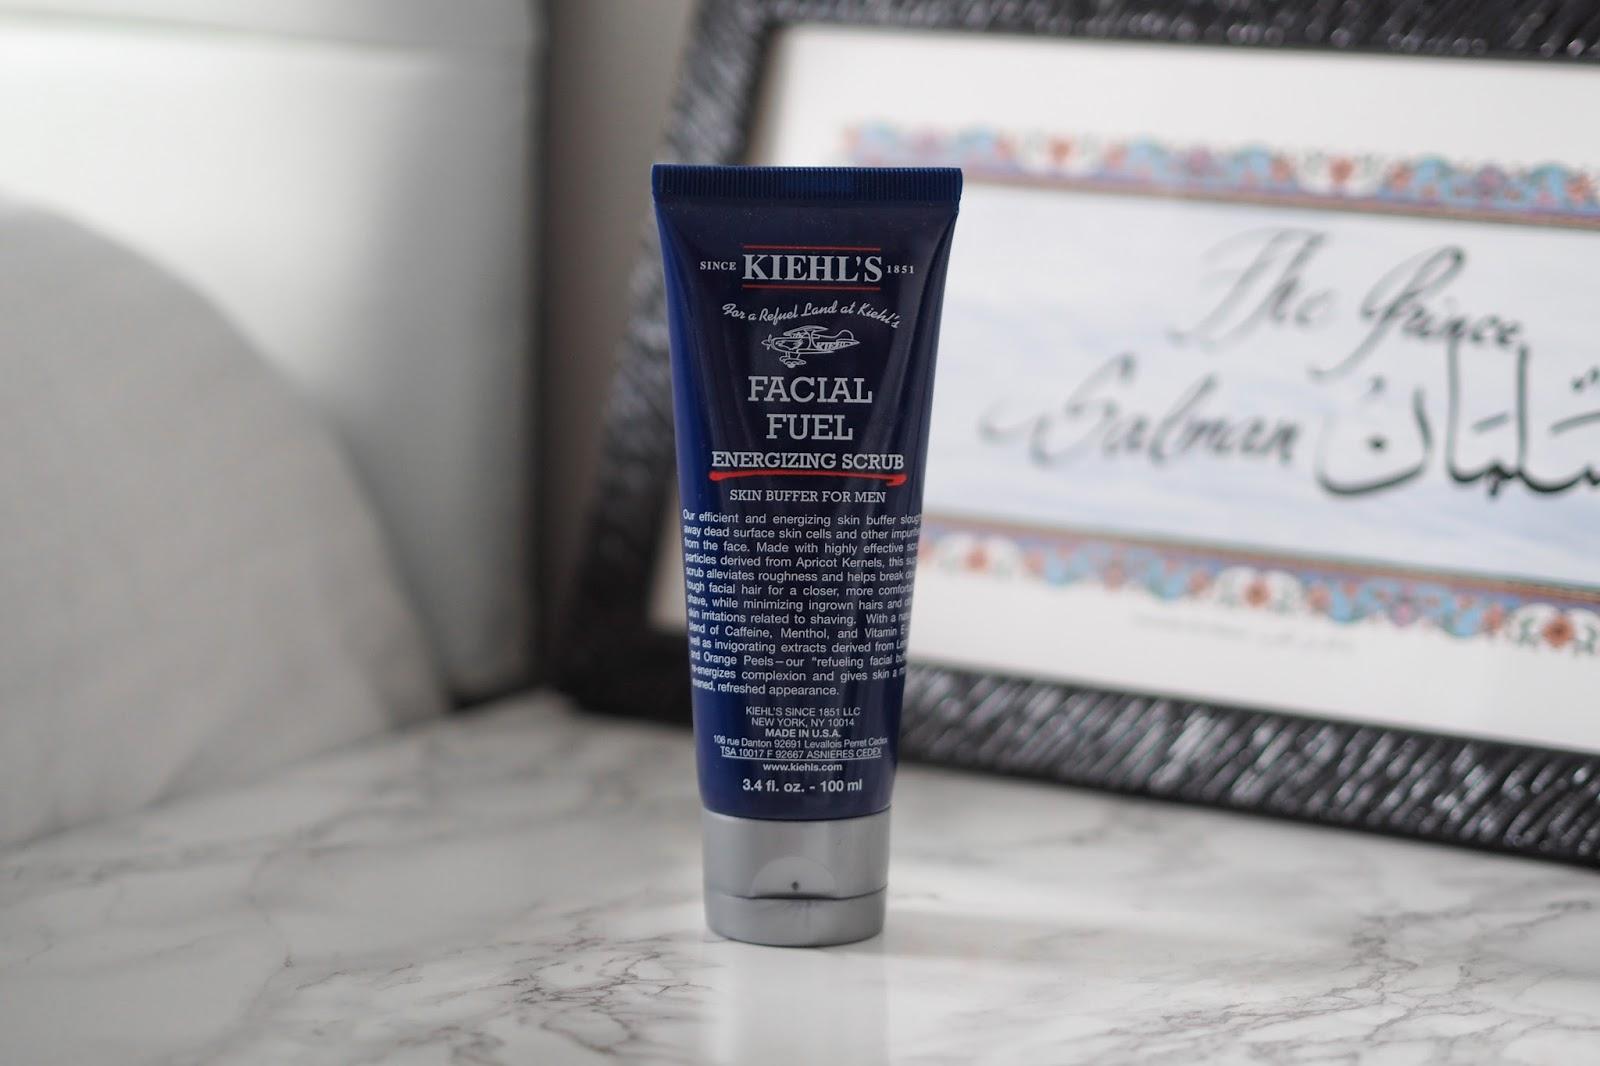 Kiehl's Facial Fuel Face Scrub